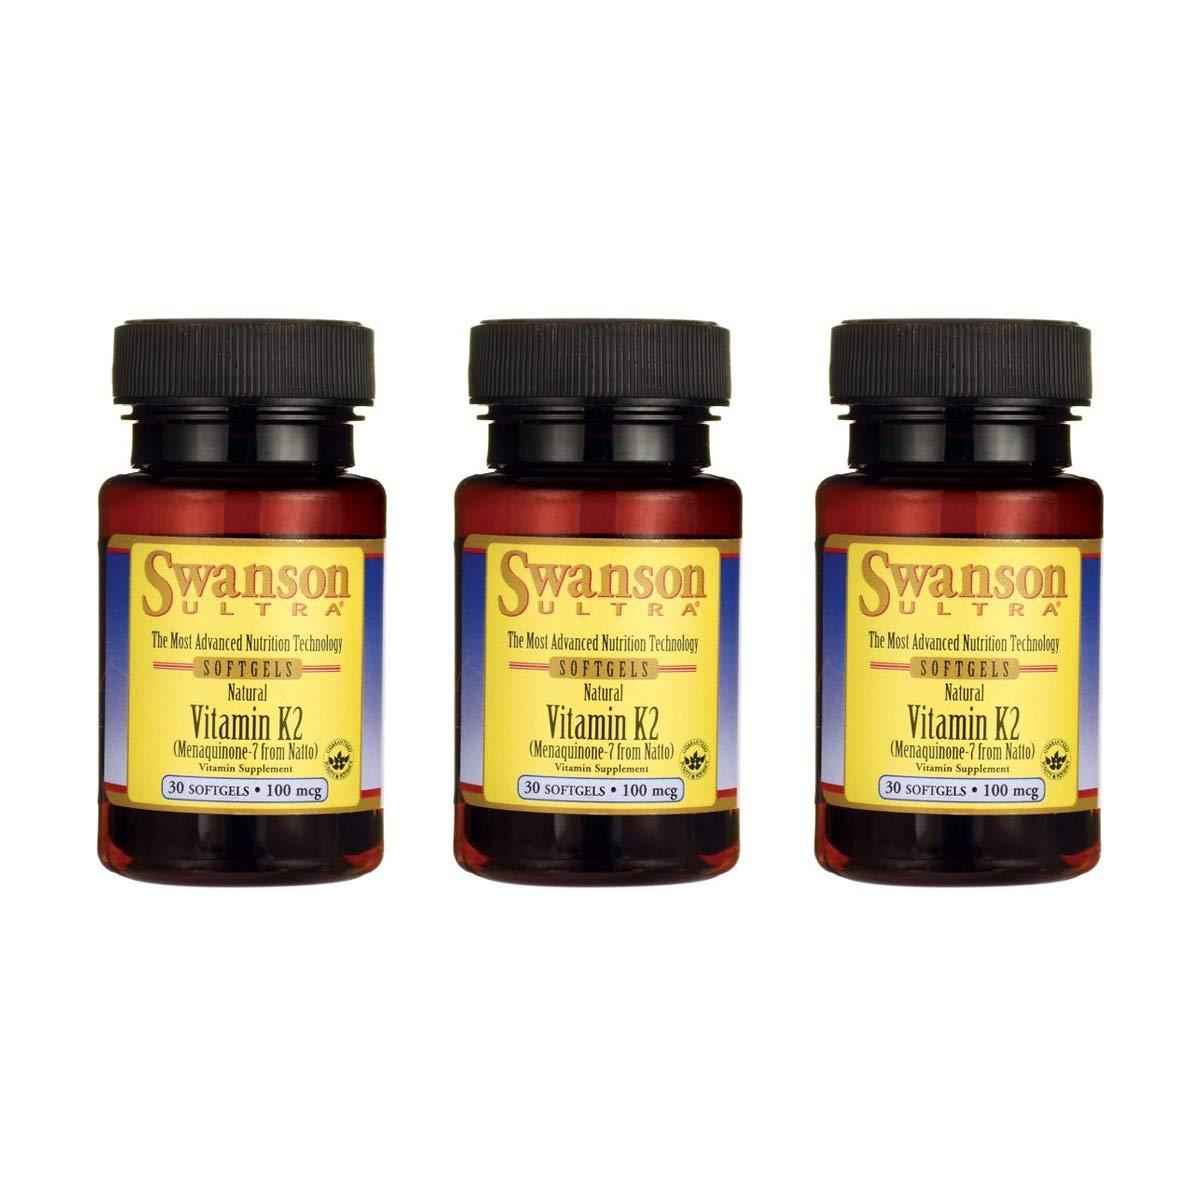 Swanson Vitamin K-2 - Natural 100 mcg 30 Sgels 3 Pack